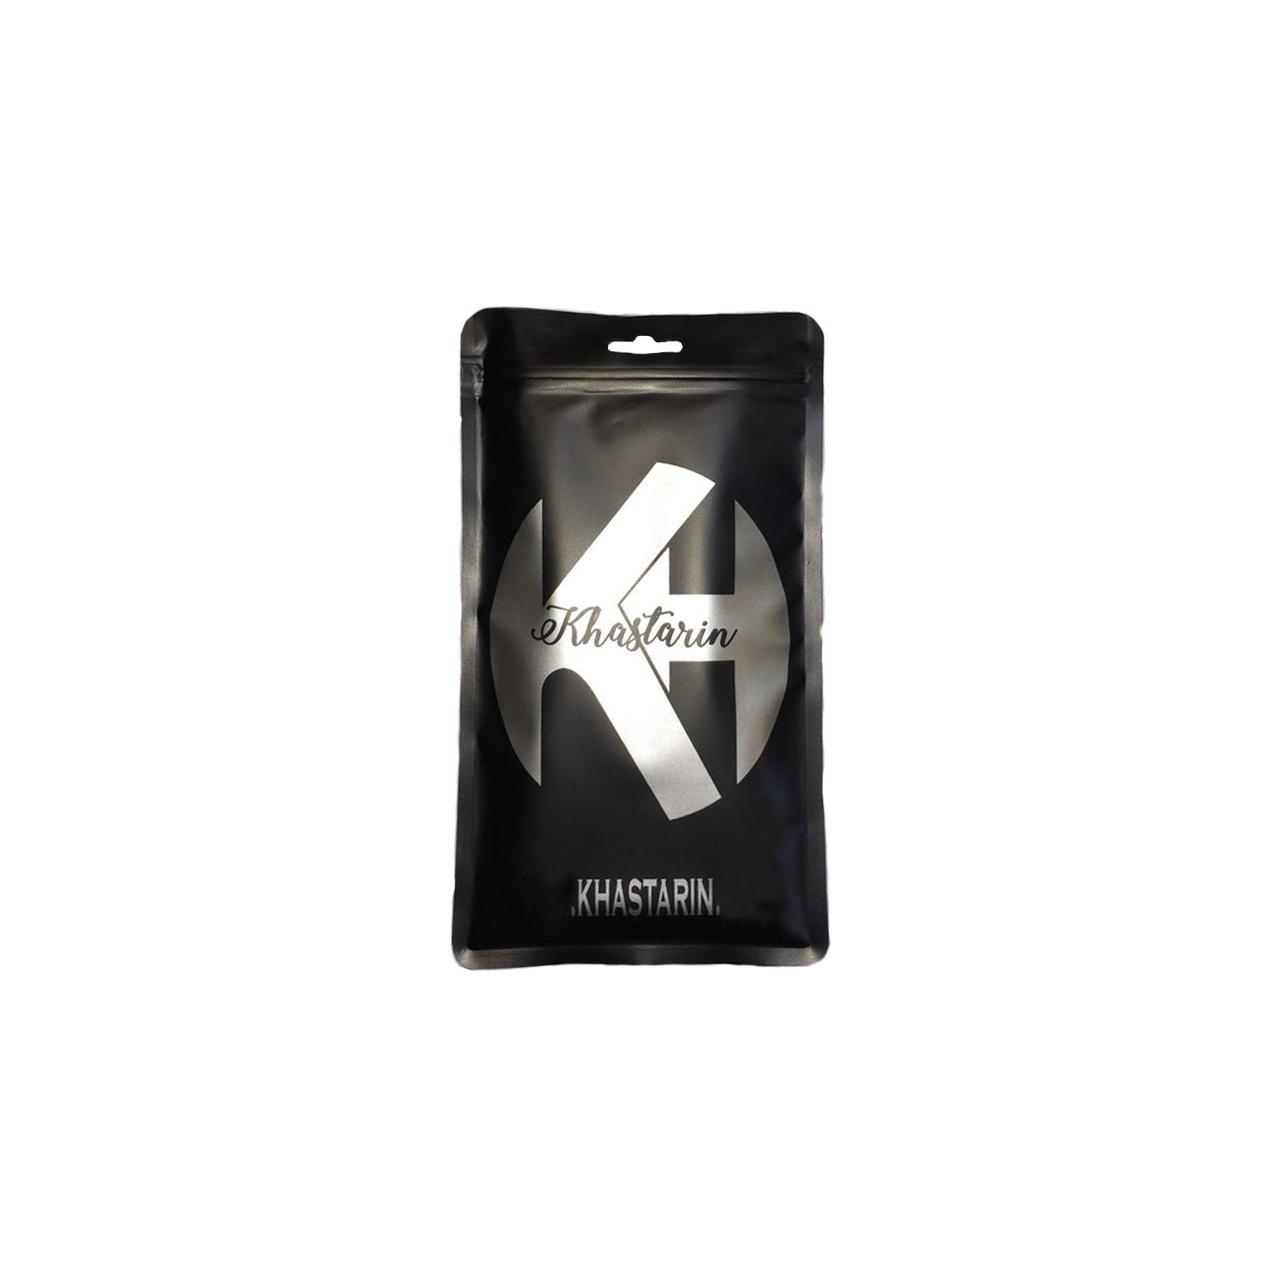 کاور کی اچ کد 6408 مناسب برای گوشی موبایل سونی Xperia XA 2016 thumb 2 2